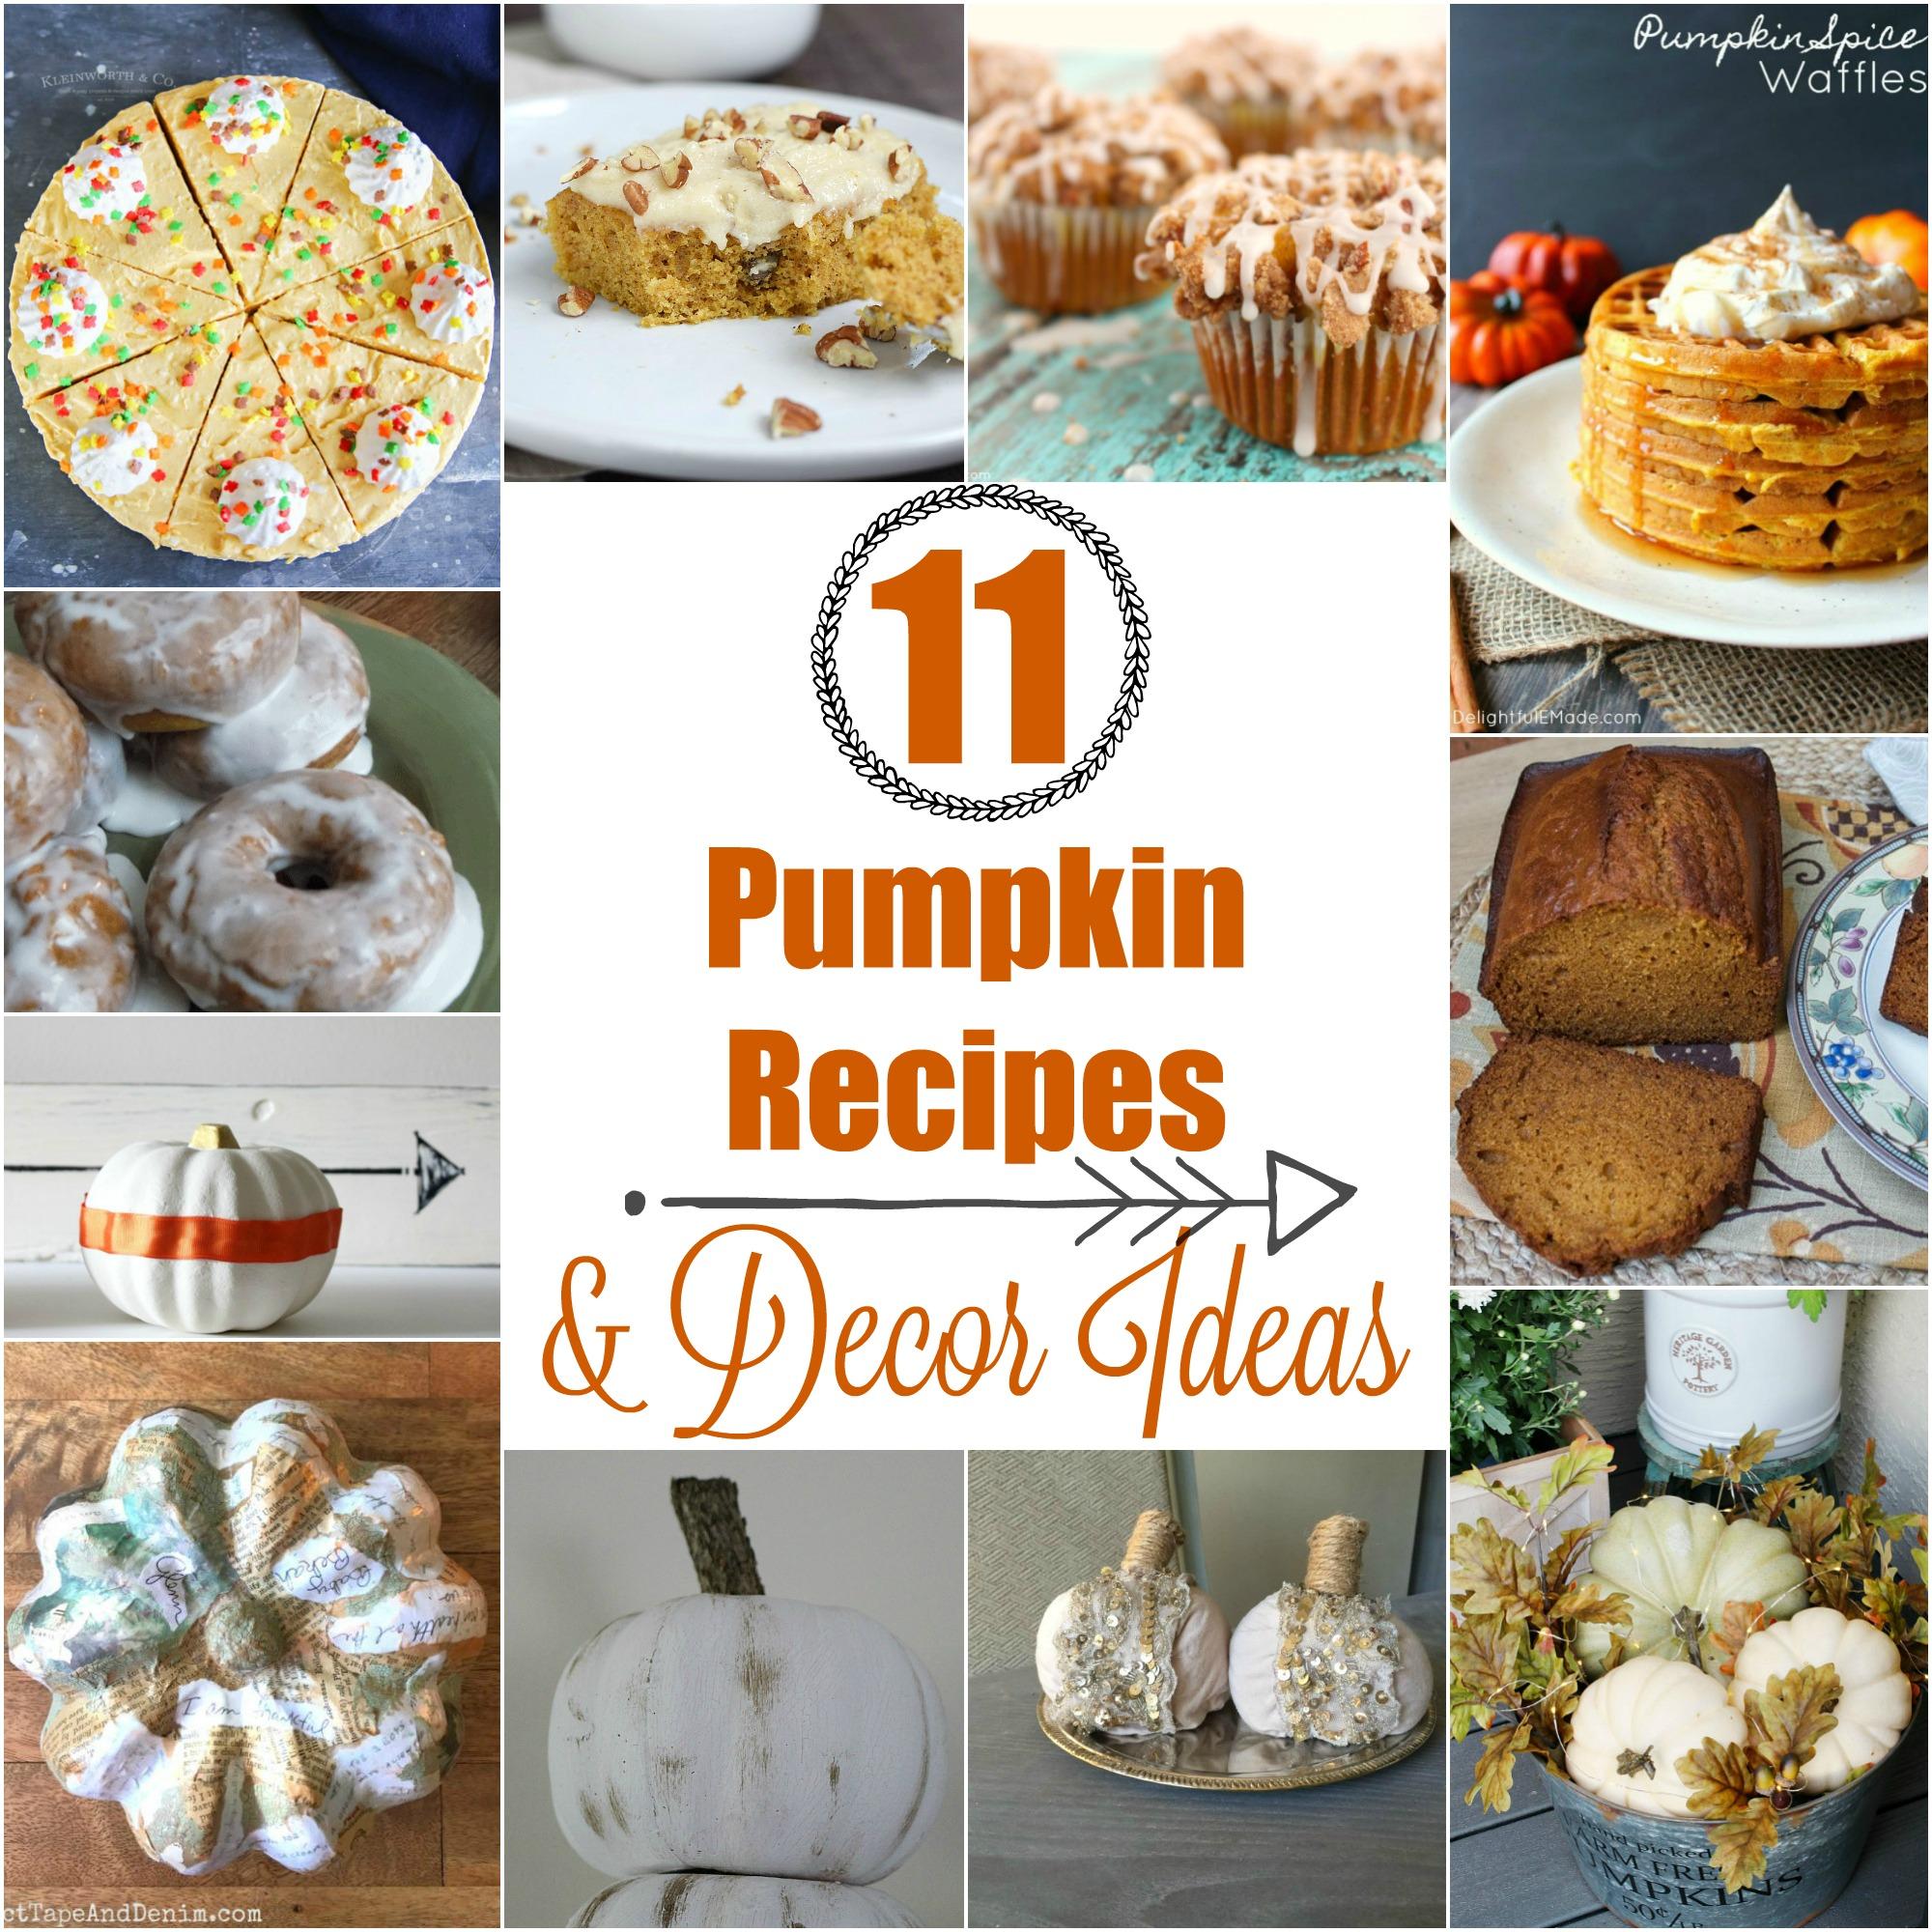 11 Pumpkin Recipes and Decor Ideas